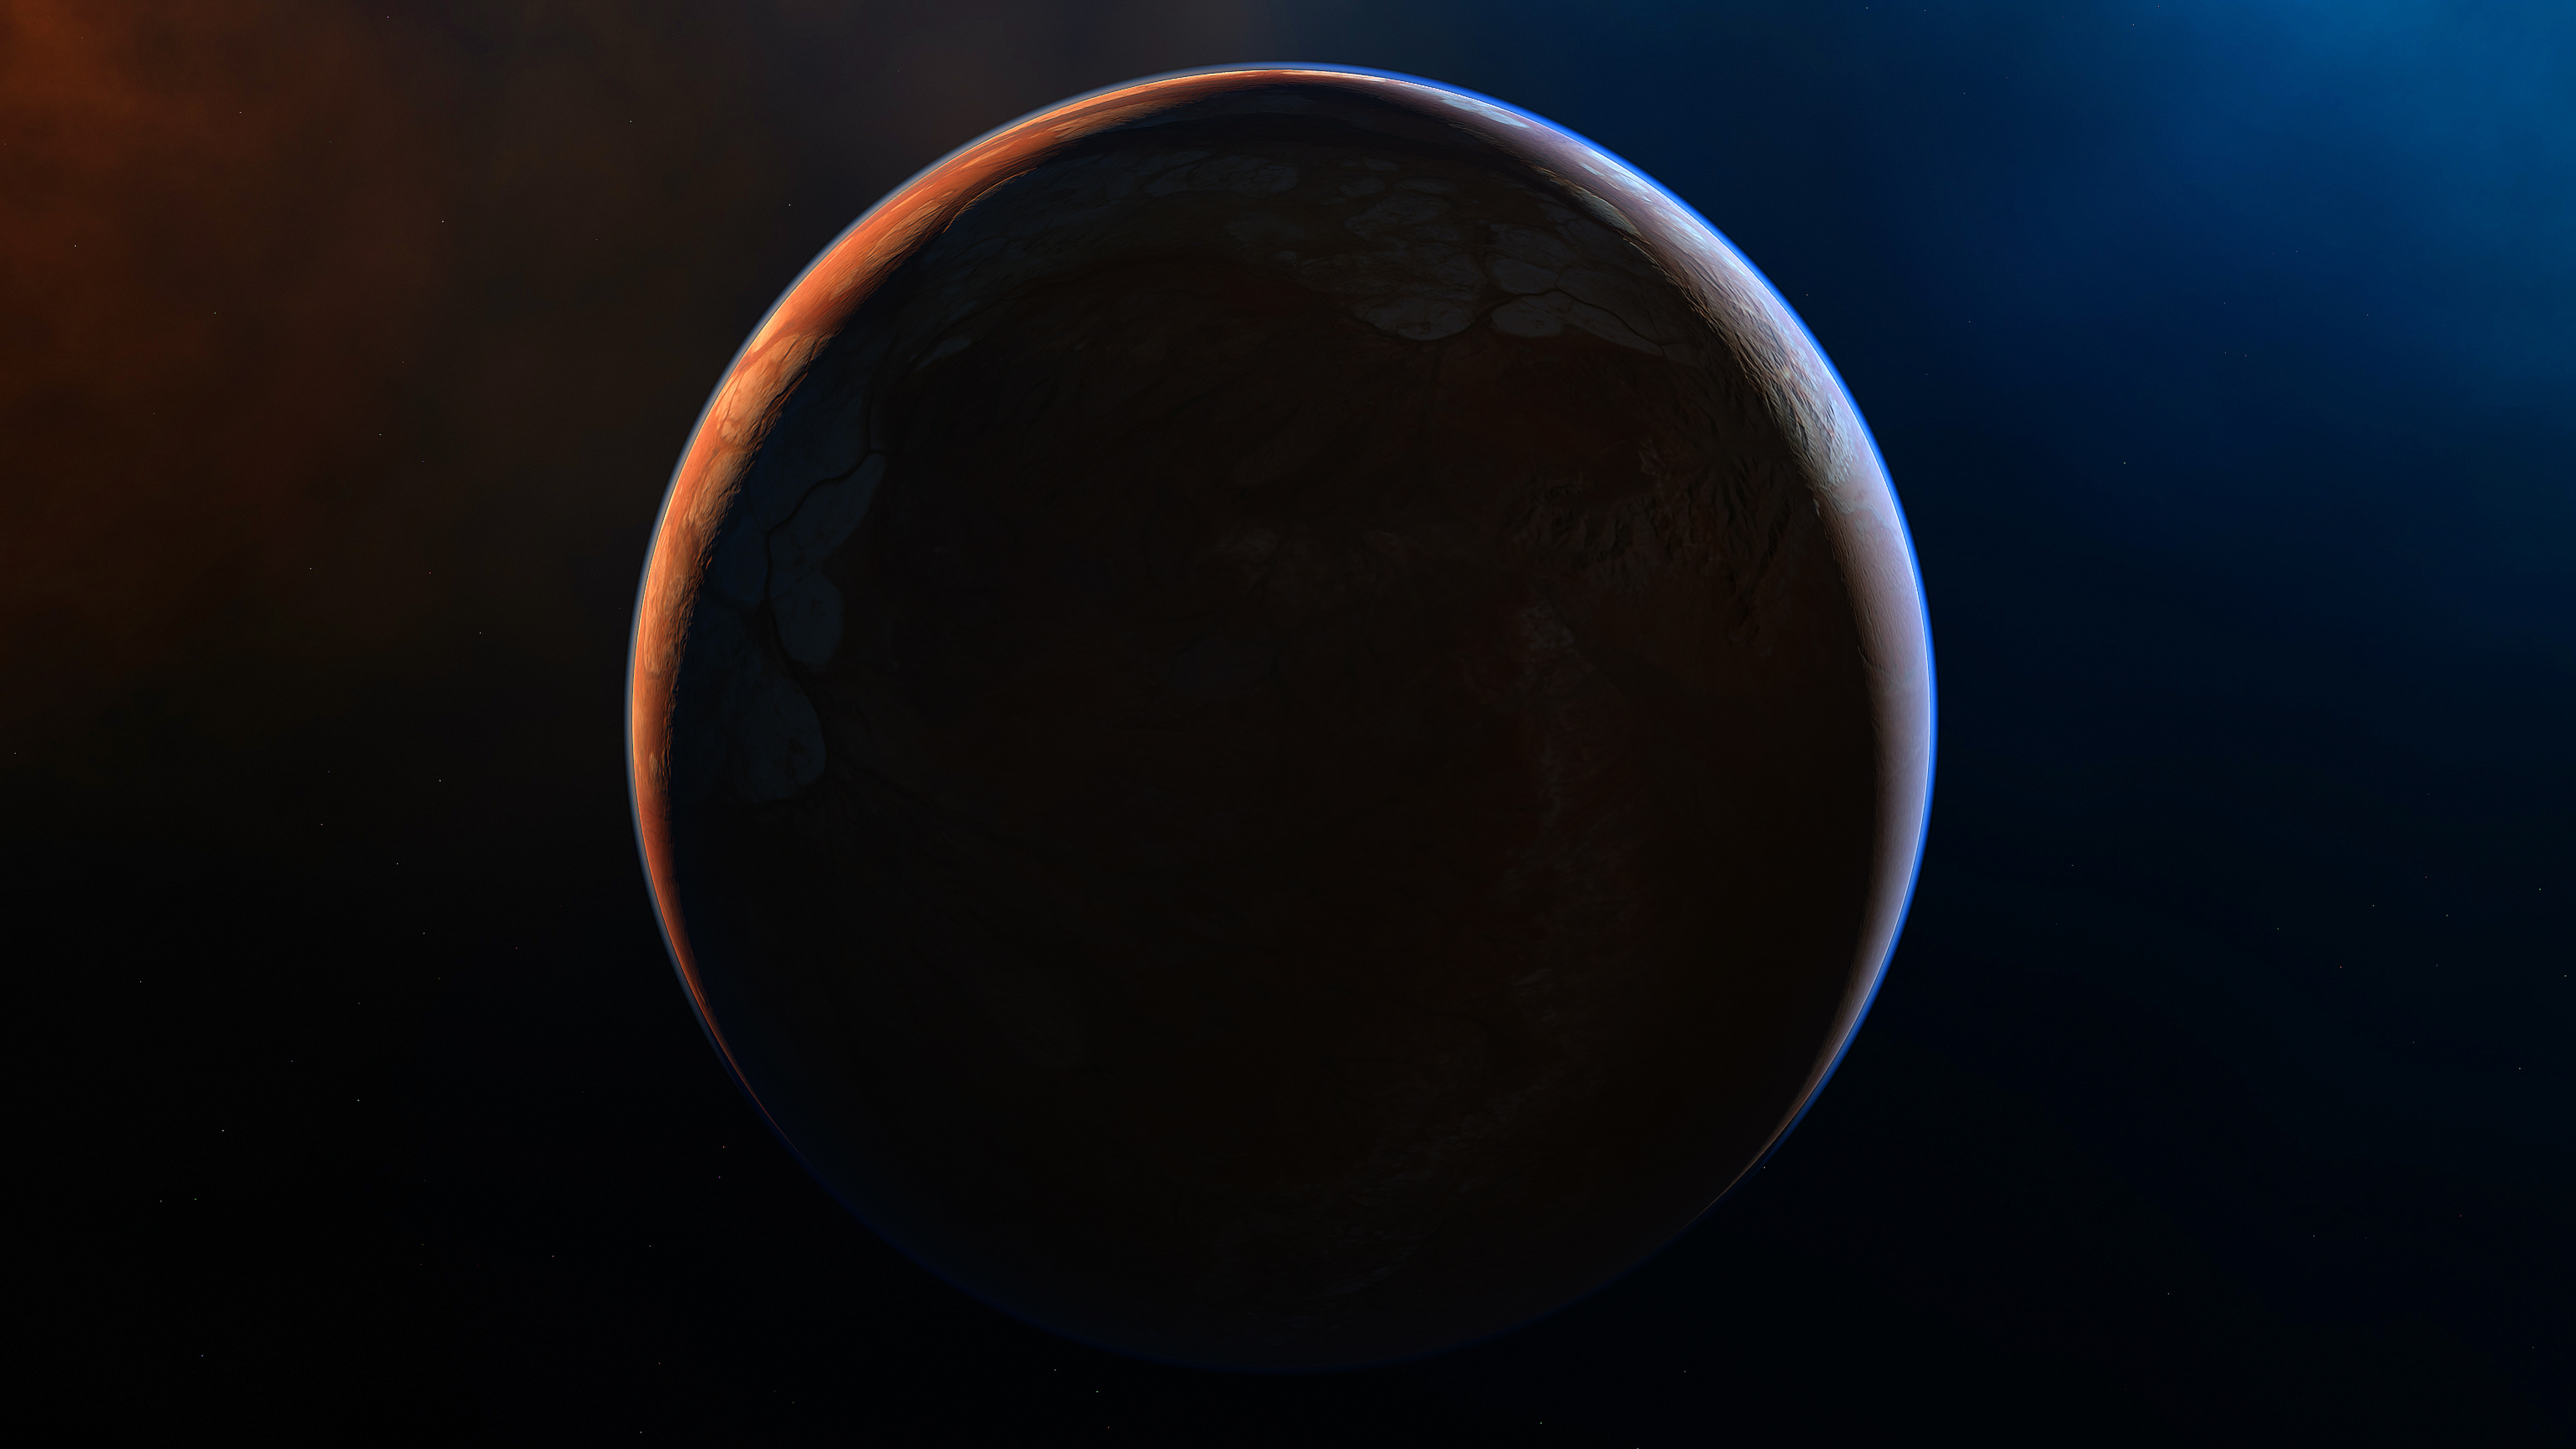 scifi space planet 4k 1546279216 - Scifi Space Planet 4k - planet wallpapers, hd-wallpapers, digital universe wallpapers, deviantart wallpapers, 4k-wallpapers